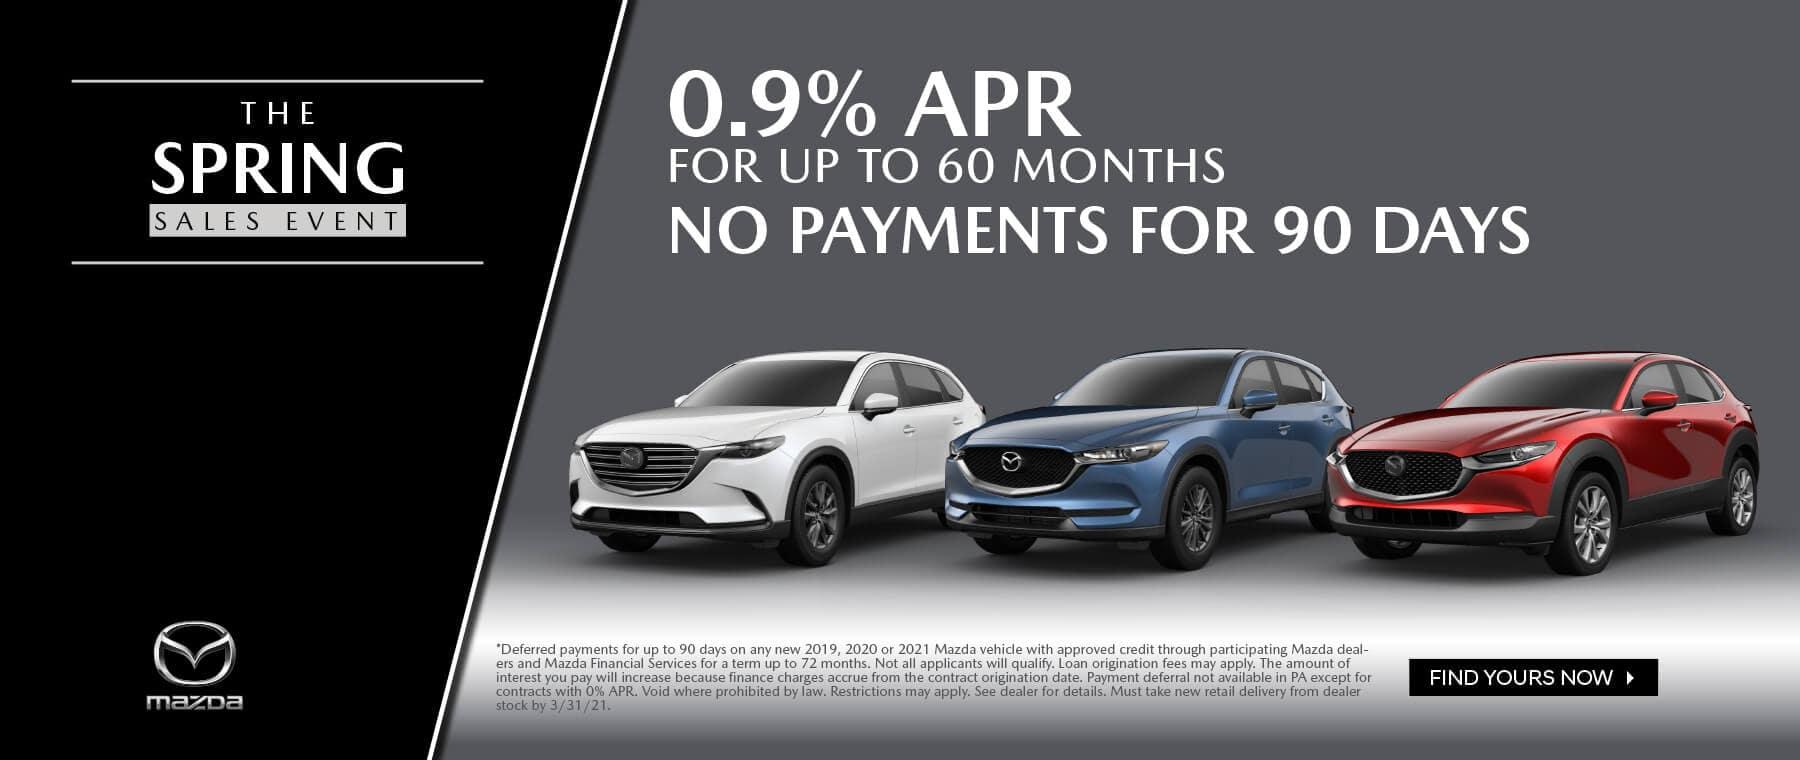 2021.02.24-Keffer-Mazda-MAR-Web-Banners-S51082vw-1